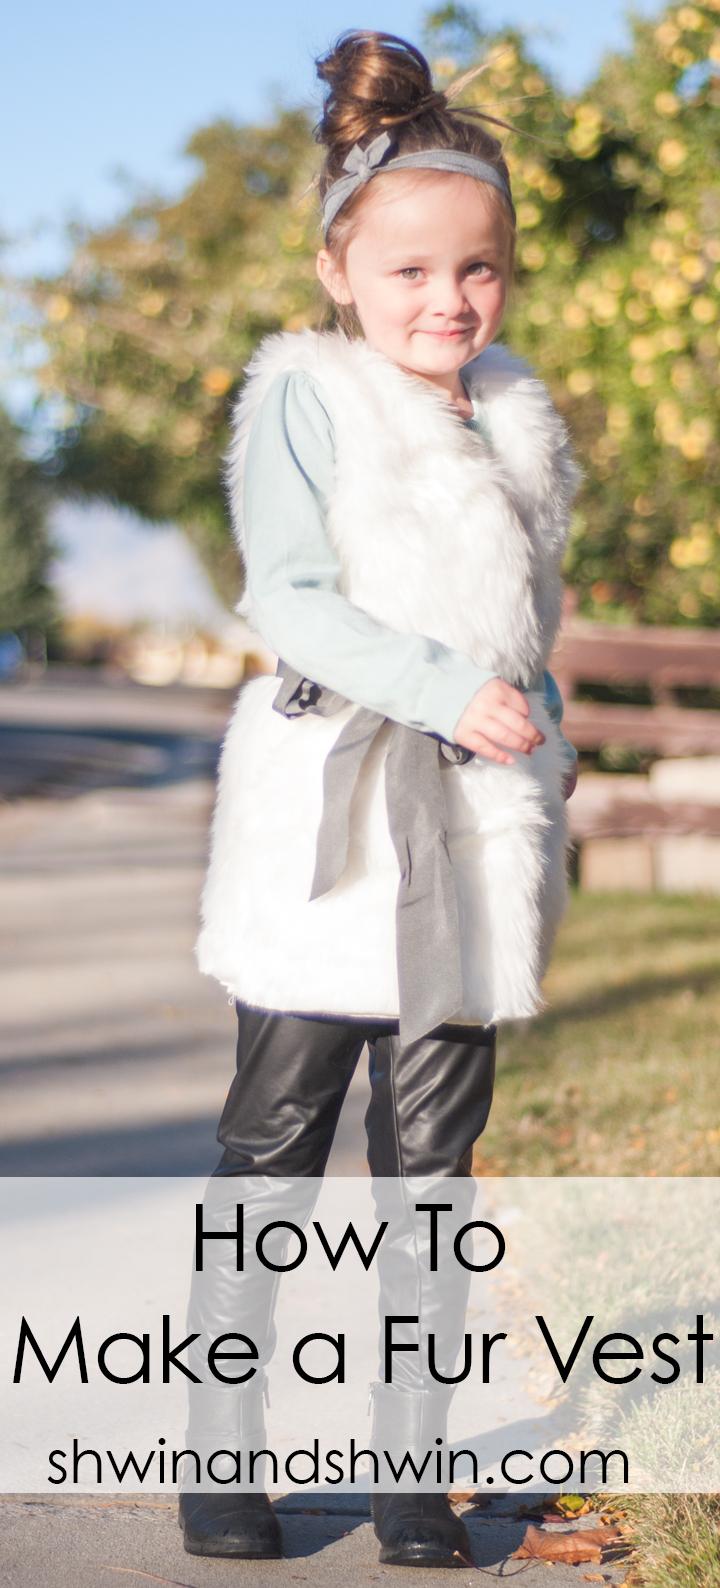 How to make a fur vest || Shwin&Shwin